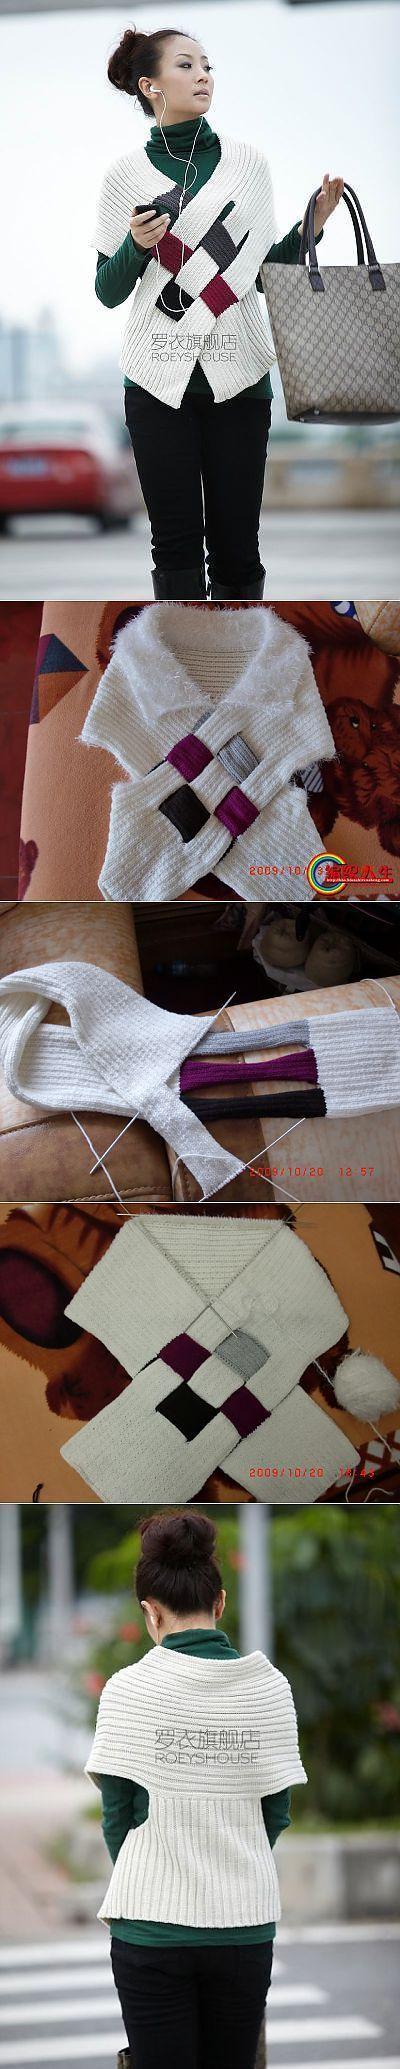 "Оригинальная кофточка.... | вязание | Постила [   ""Posts on the topic of вязание added by Любовь Сергеева"" ] #<br/> # #Shawl #Patterns,<br/> # #Originals,<br/> # #Knitted #Shawls,<br/> # #Fashion #Blouses,<br/> # #Women"